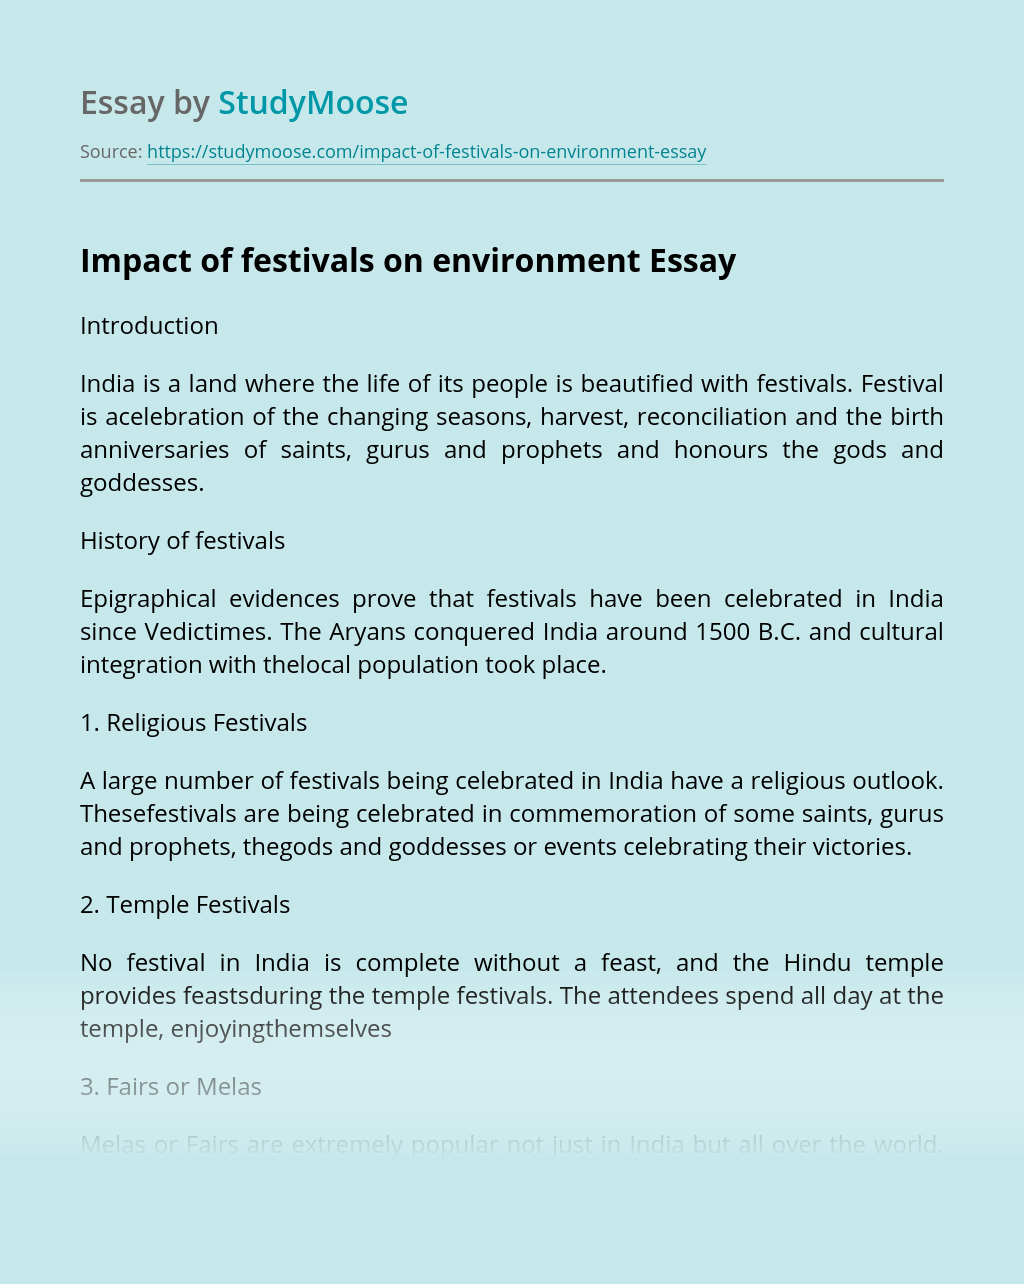 Impact of festivals on environment